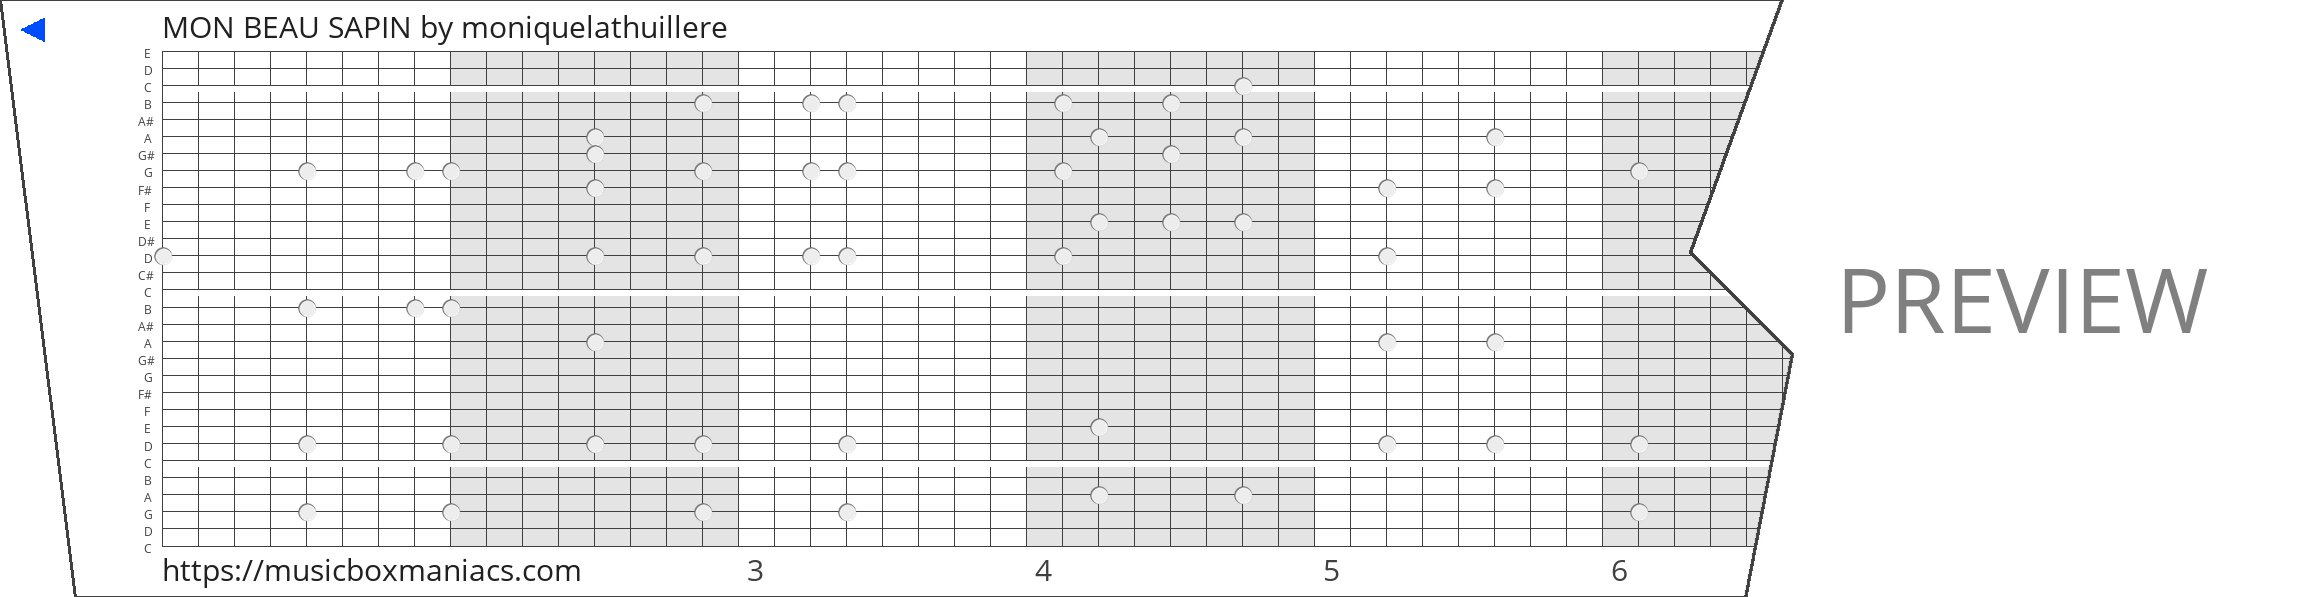 MON BEAU SAPIN 30 note music box paper strip